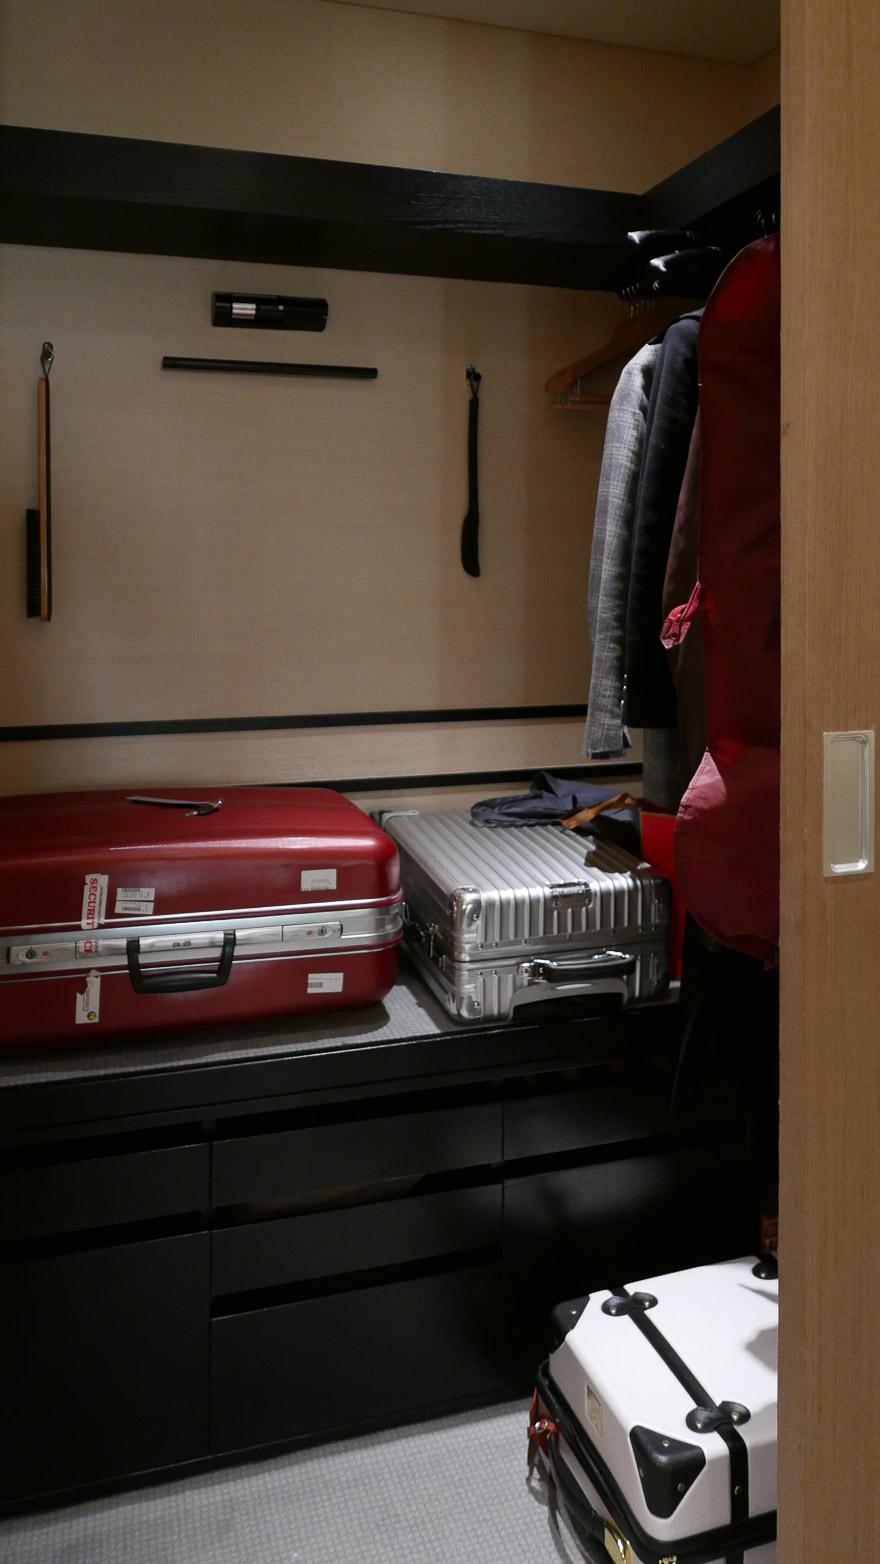 PH Tokyo suite 72 - REVIEW - Park Hyatt Tokyo : Park Suite (NYE Stay)